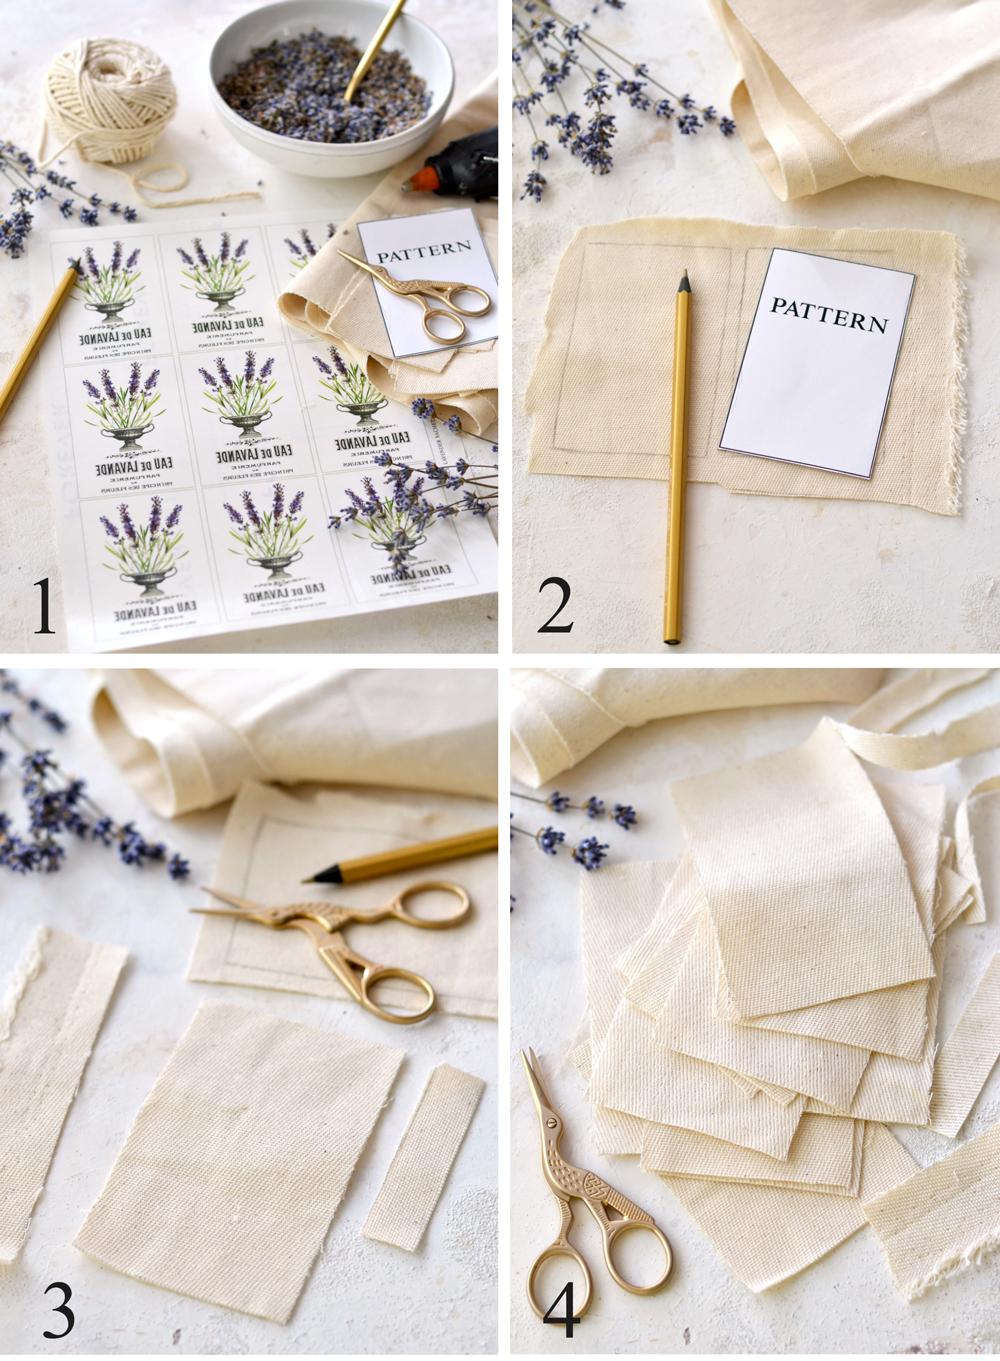 Instructions for Lavender Sachets